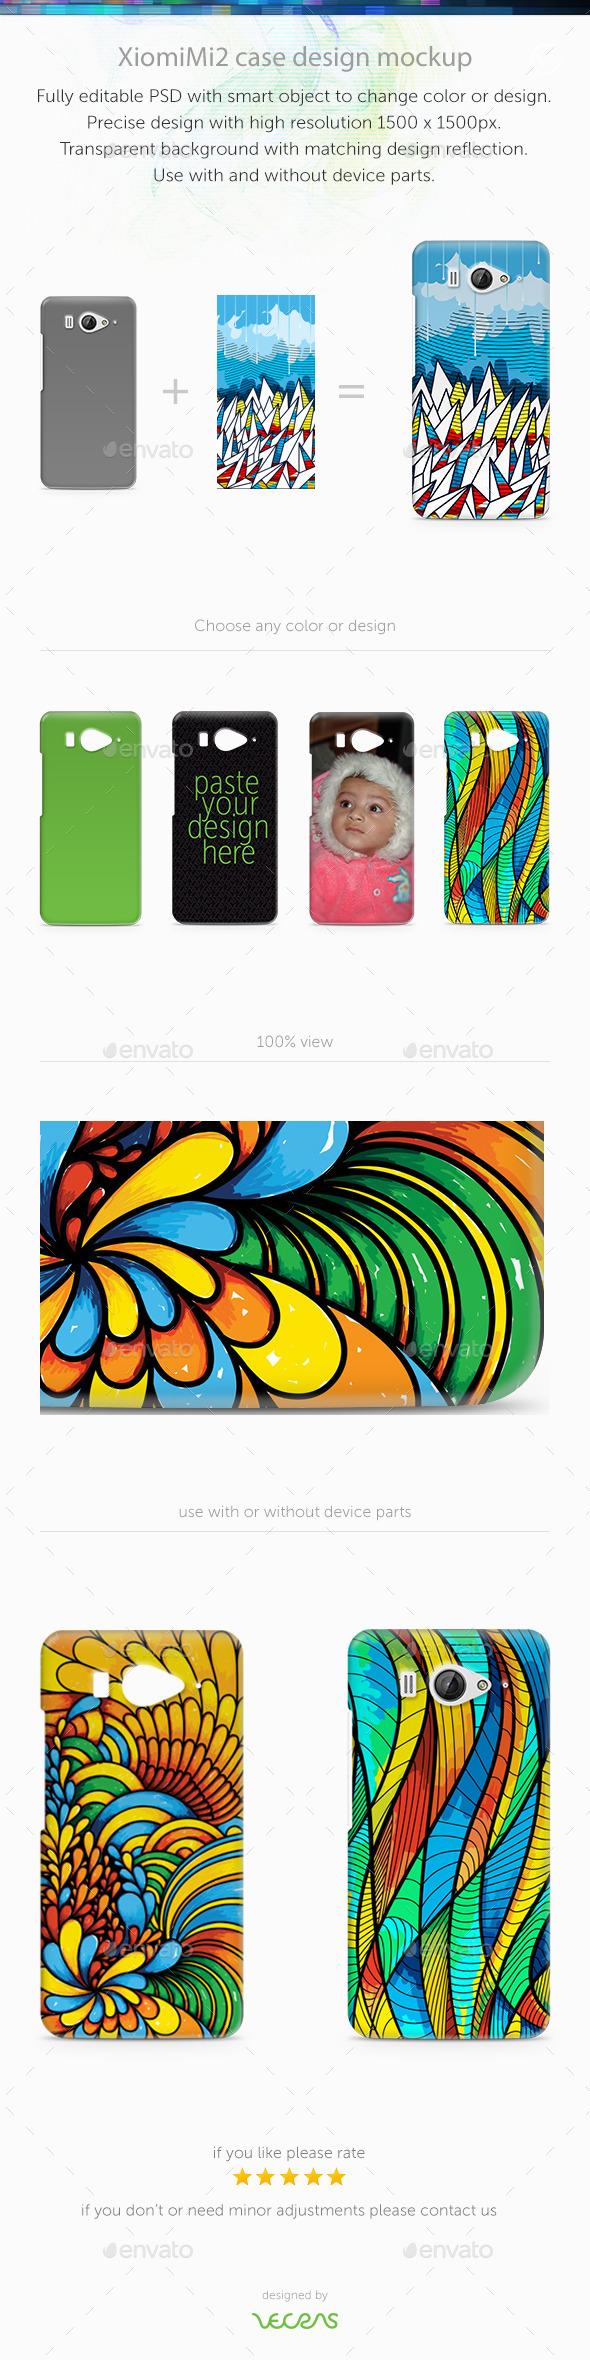 XiomiMi2 Case Design Mockup - Mobile Displays